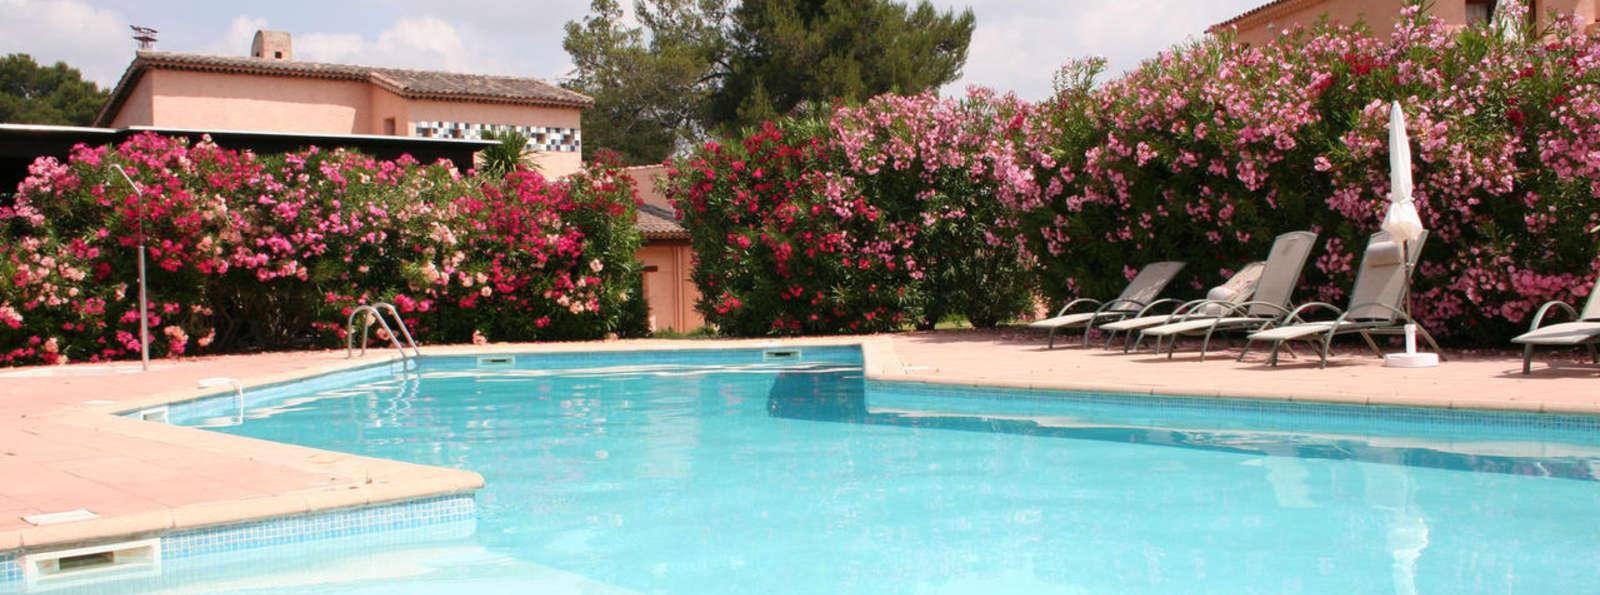 Week end weekendeals le muy partir de 95 for Hotel piscine interieure paca